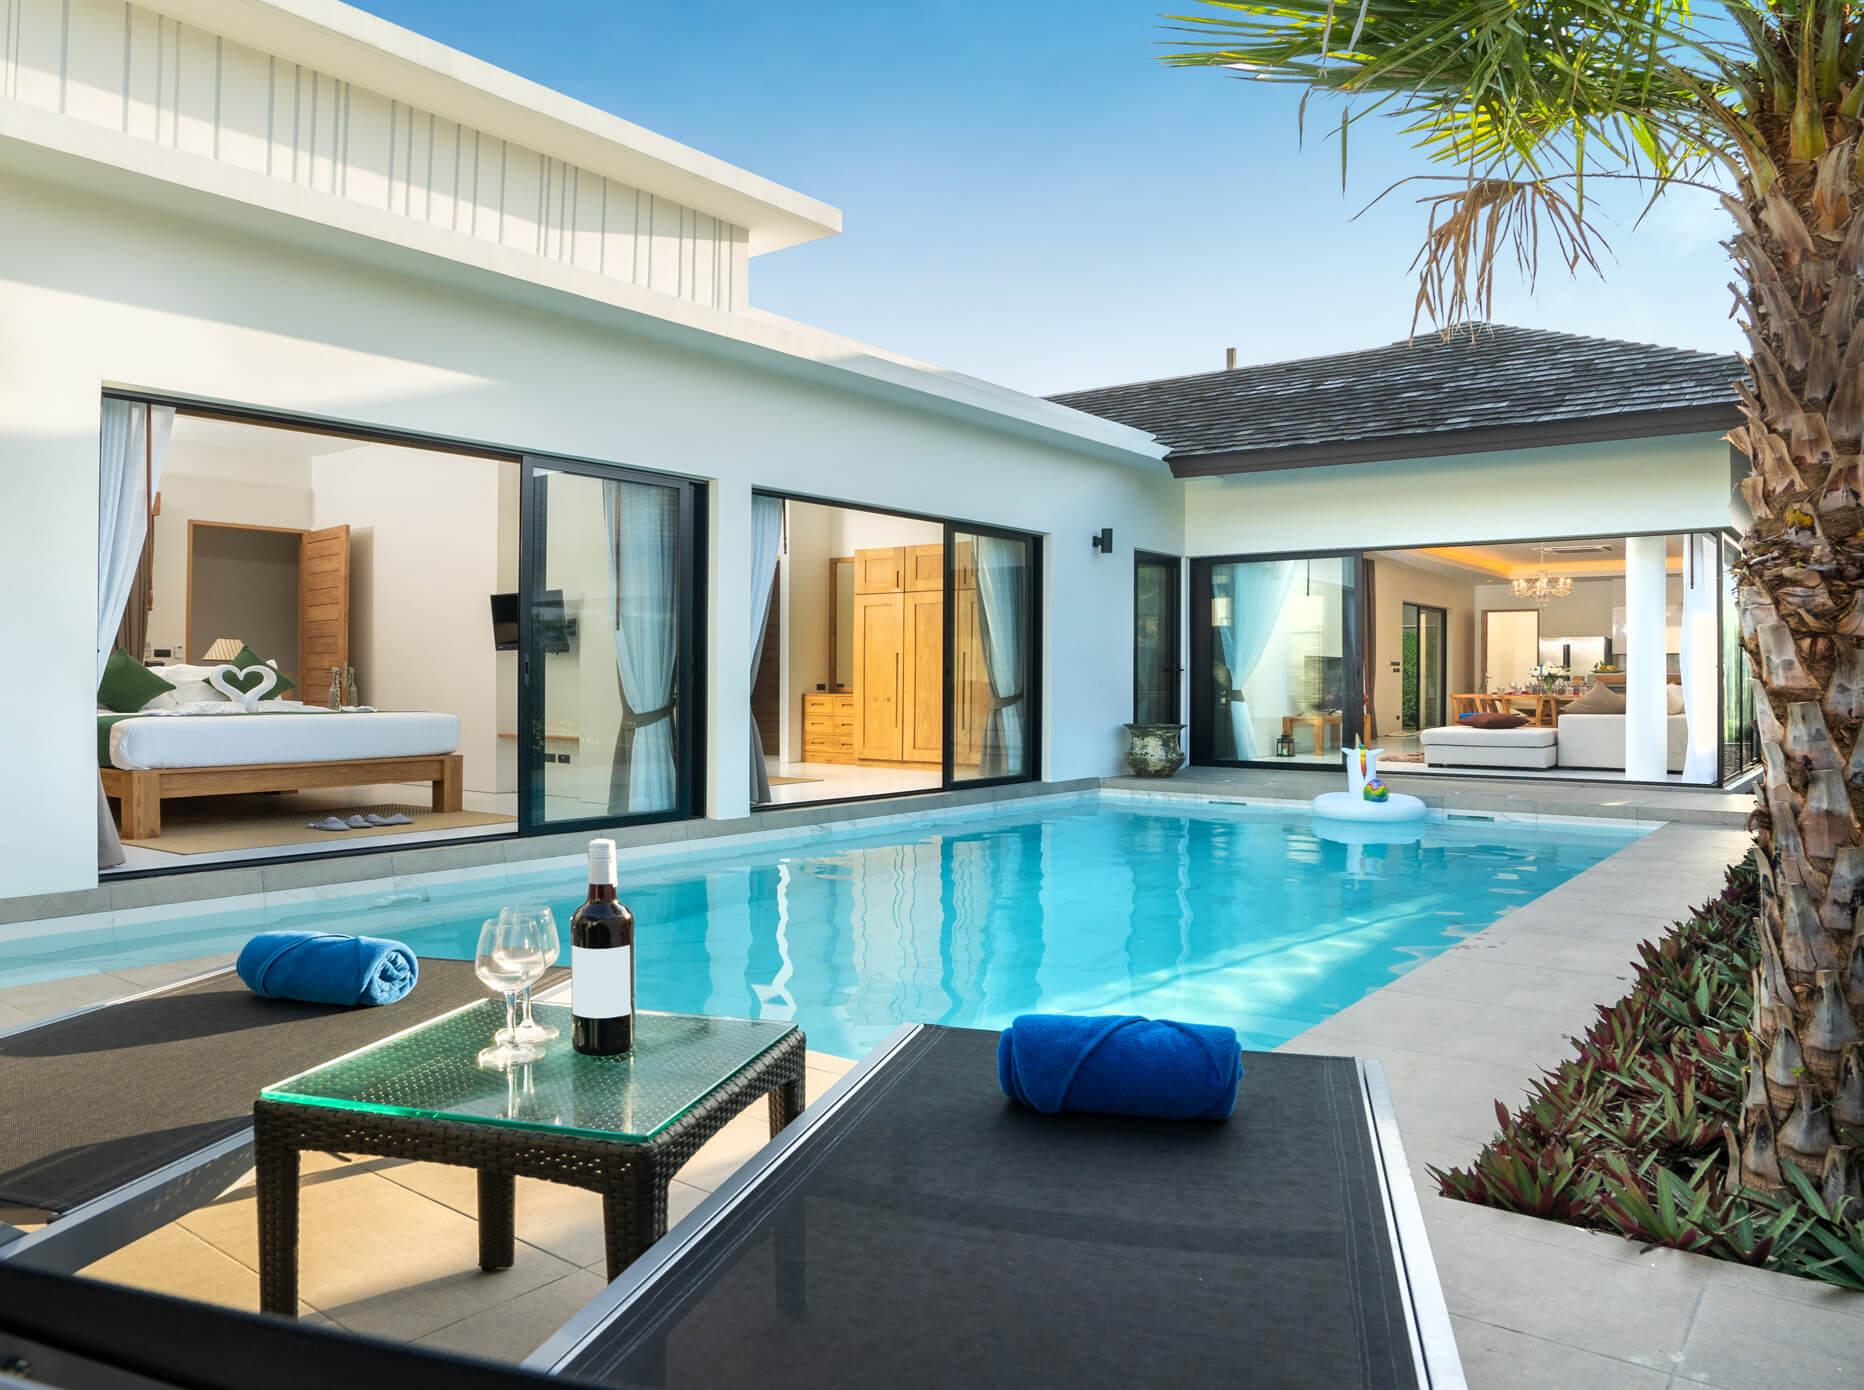 Sonja Pound Sells Pool Homes